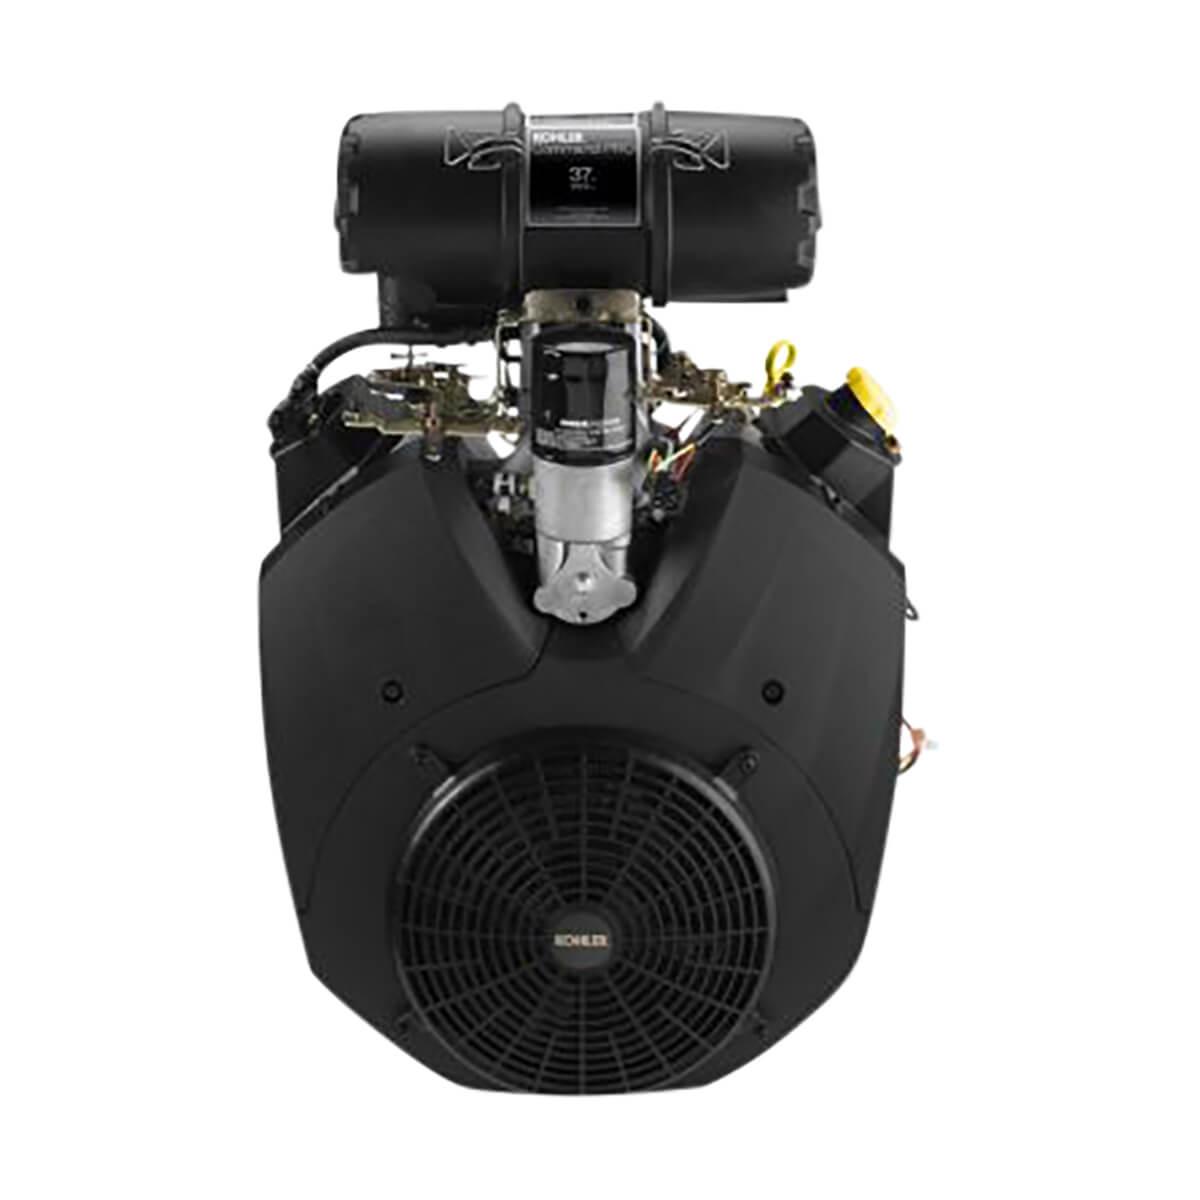 Kohler CH1000 Gas Engine